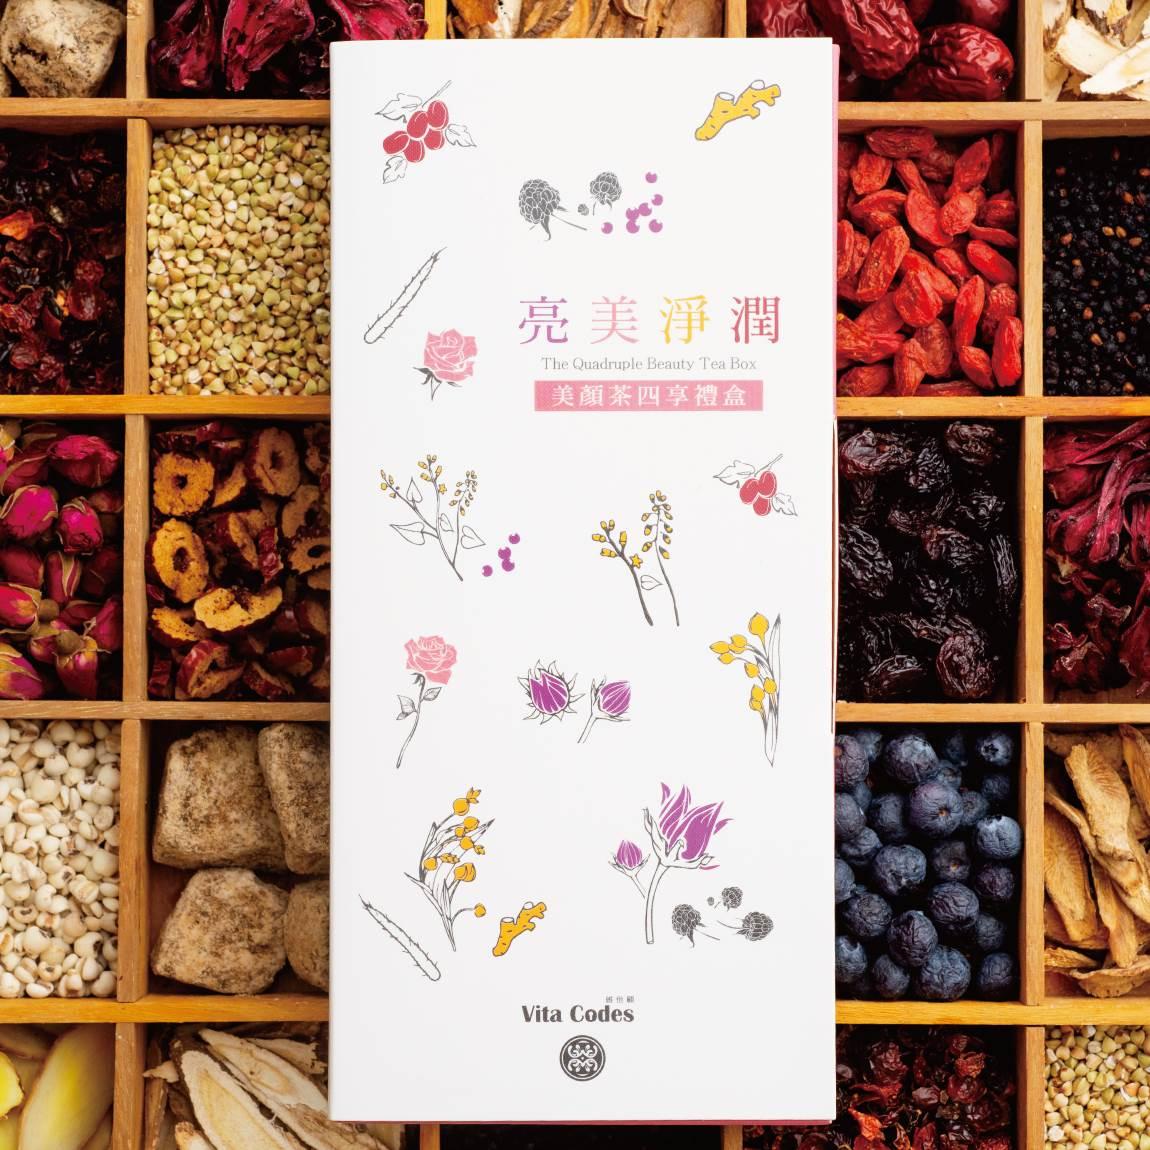 VitaCodes美顏茶-產品介紹04-5-美顏茶四享禮盒